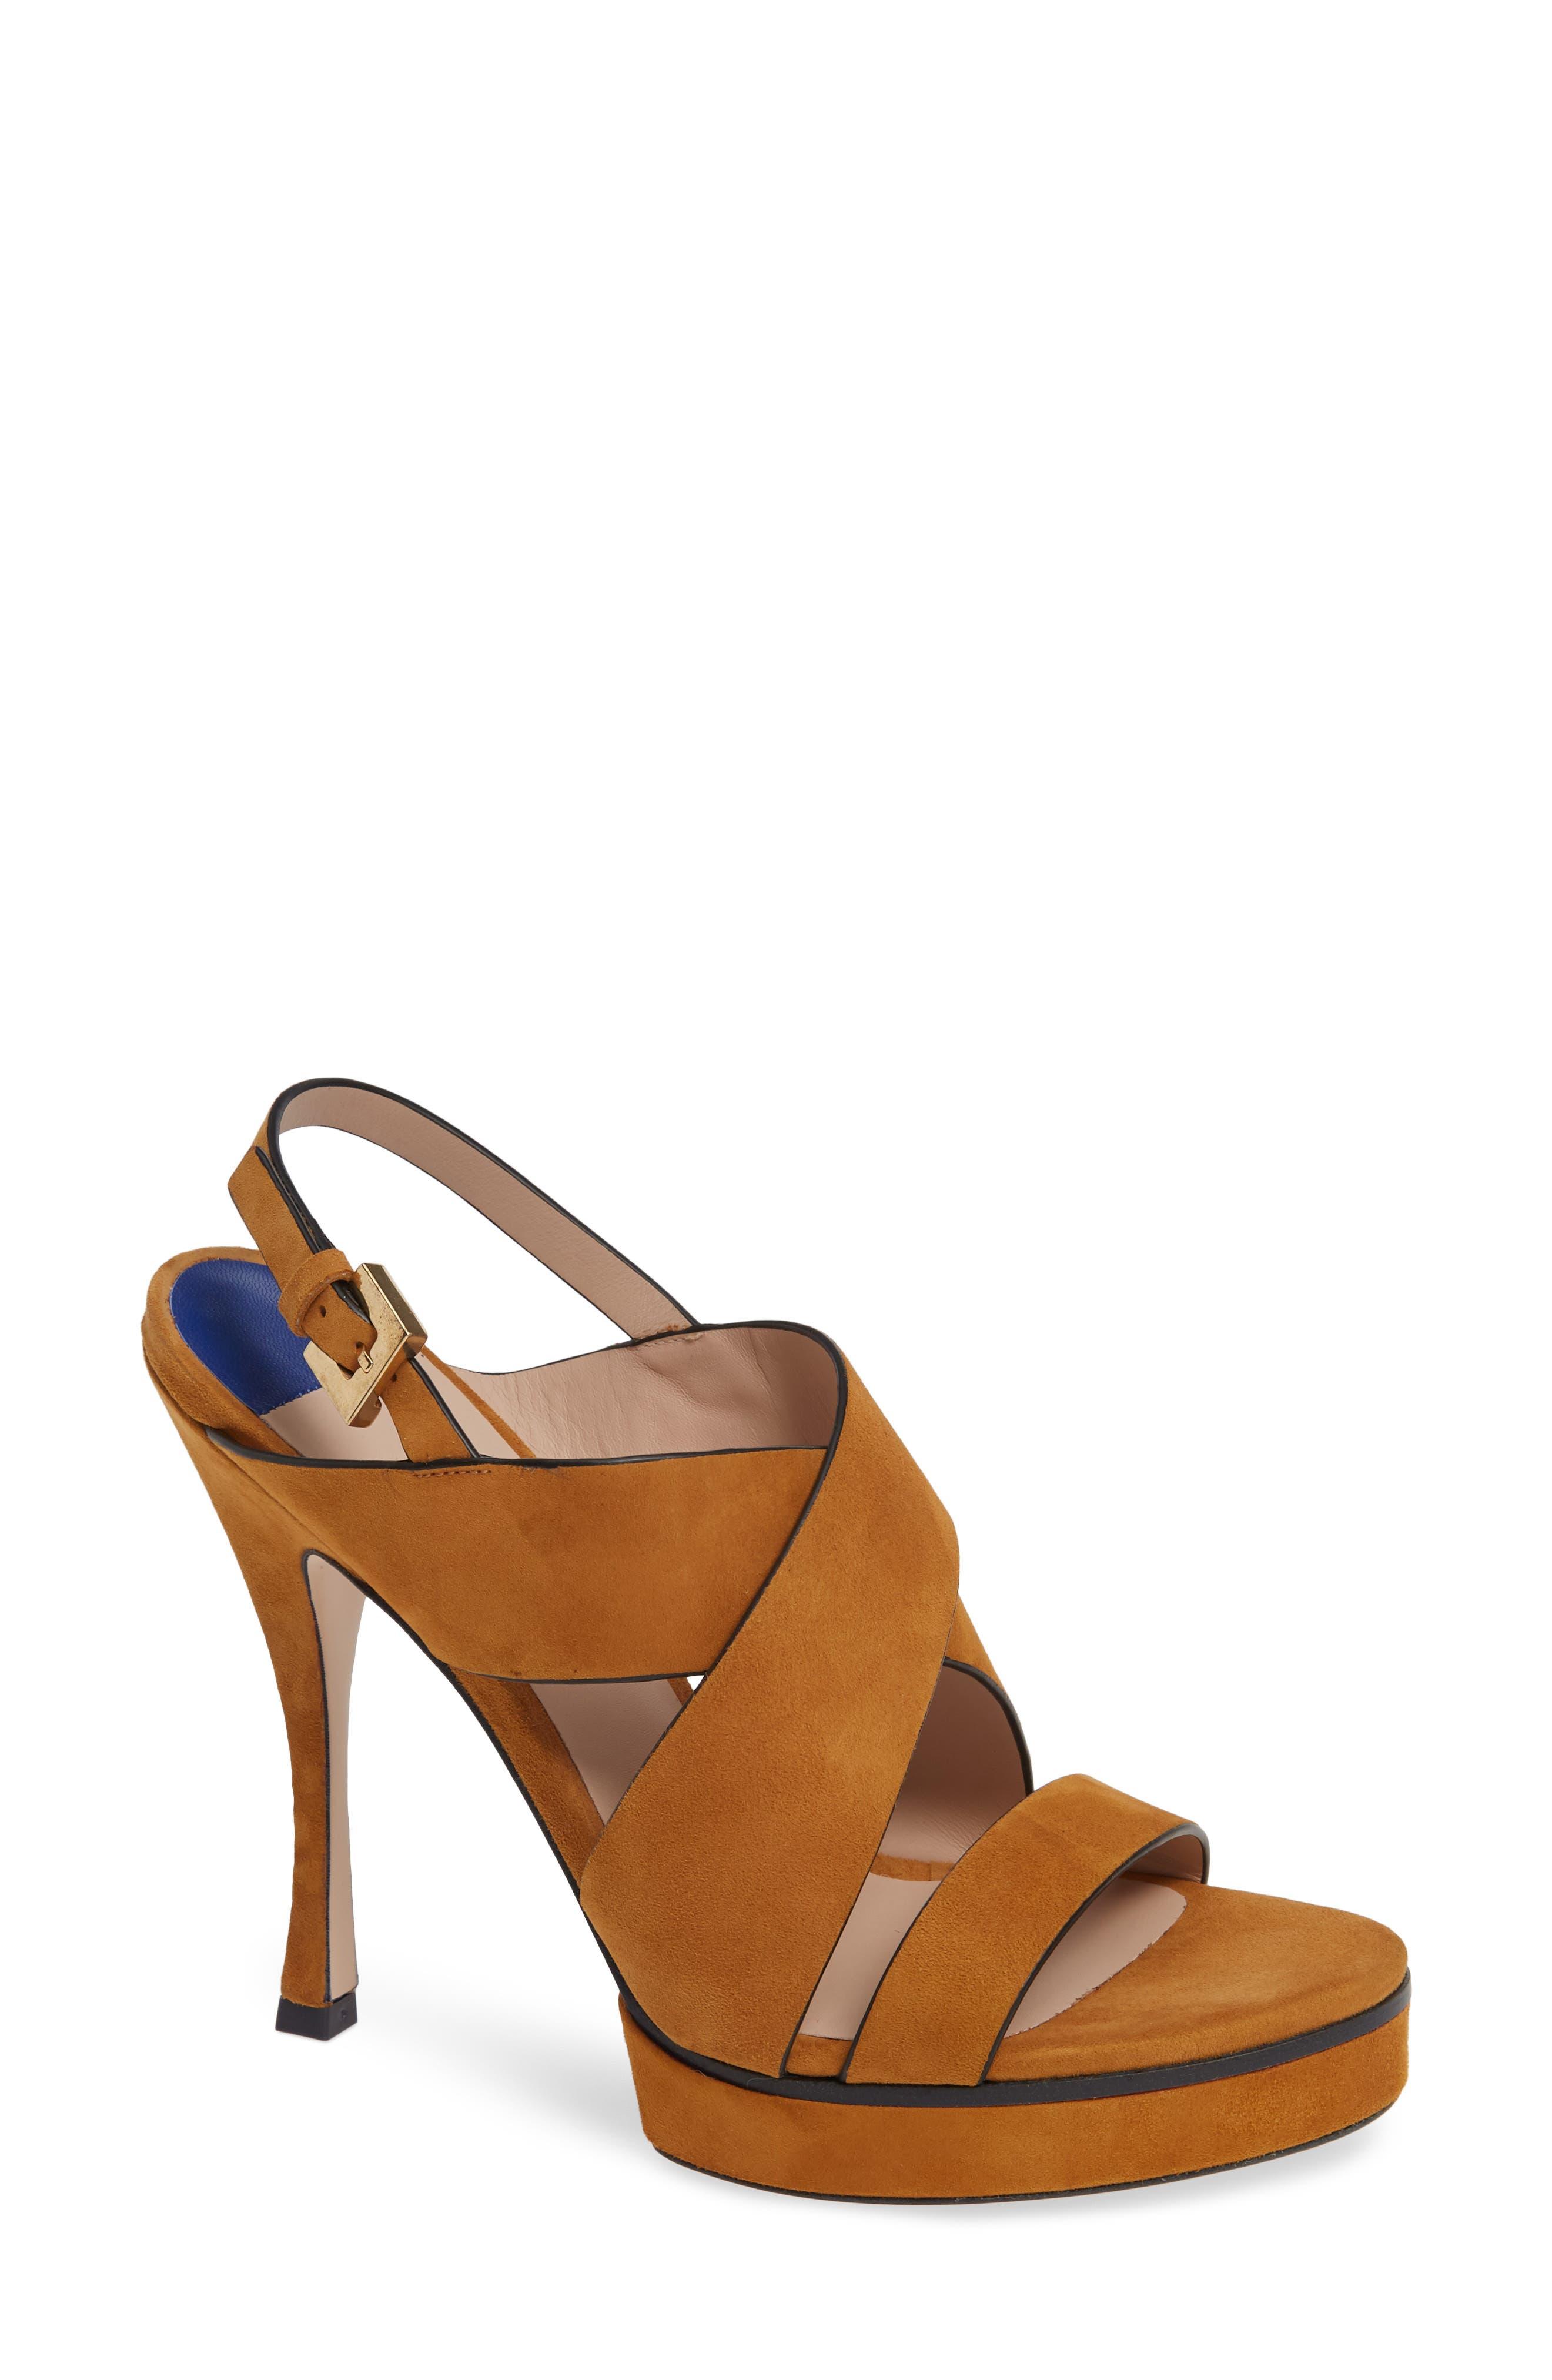 Hester Cross Strap Sandal,                         Main,                         color, BRIDLE SUEDE